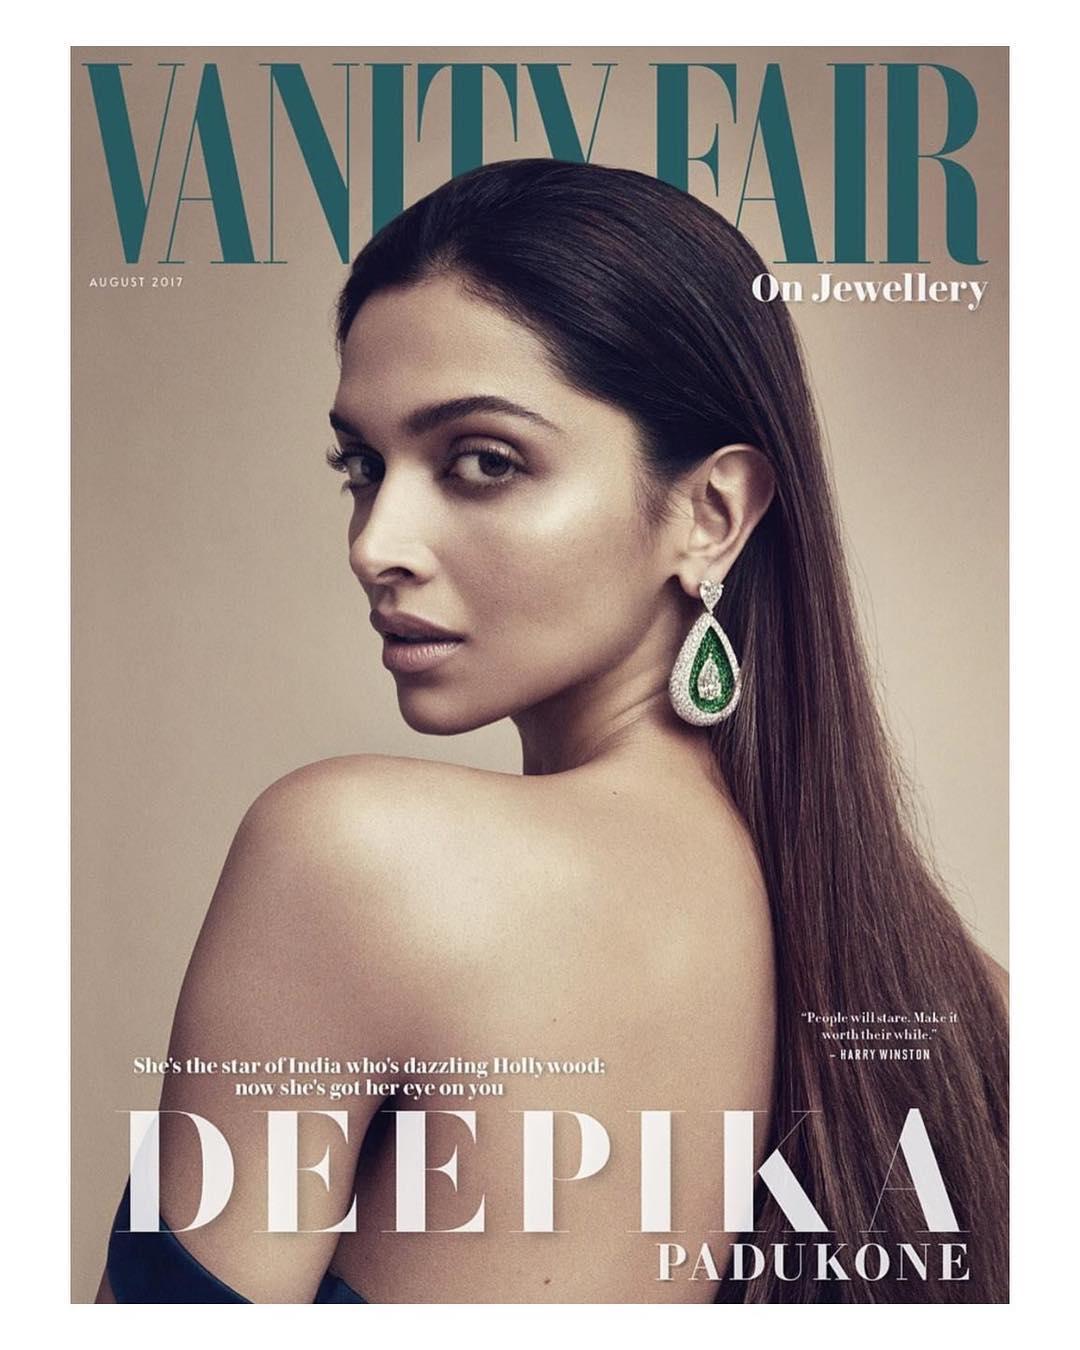 Deepika Padukone Vanity Fair magazine cover August 2017